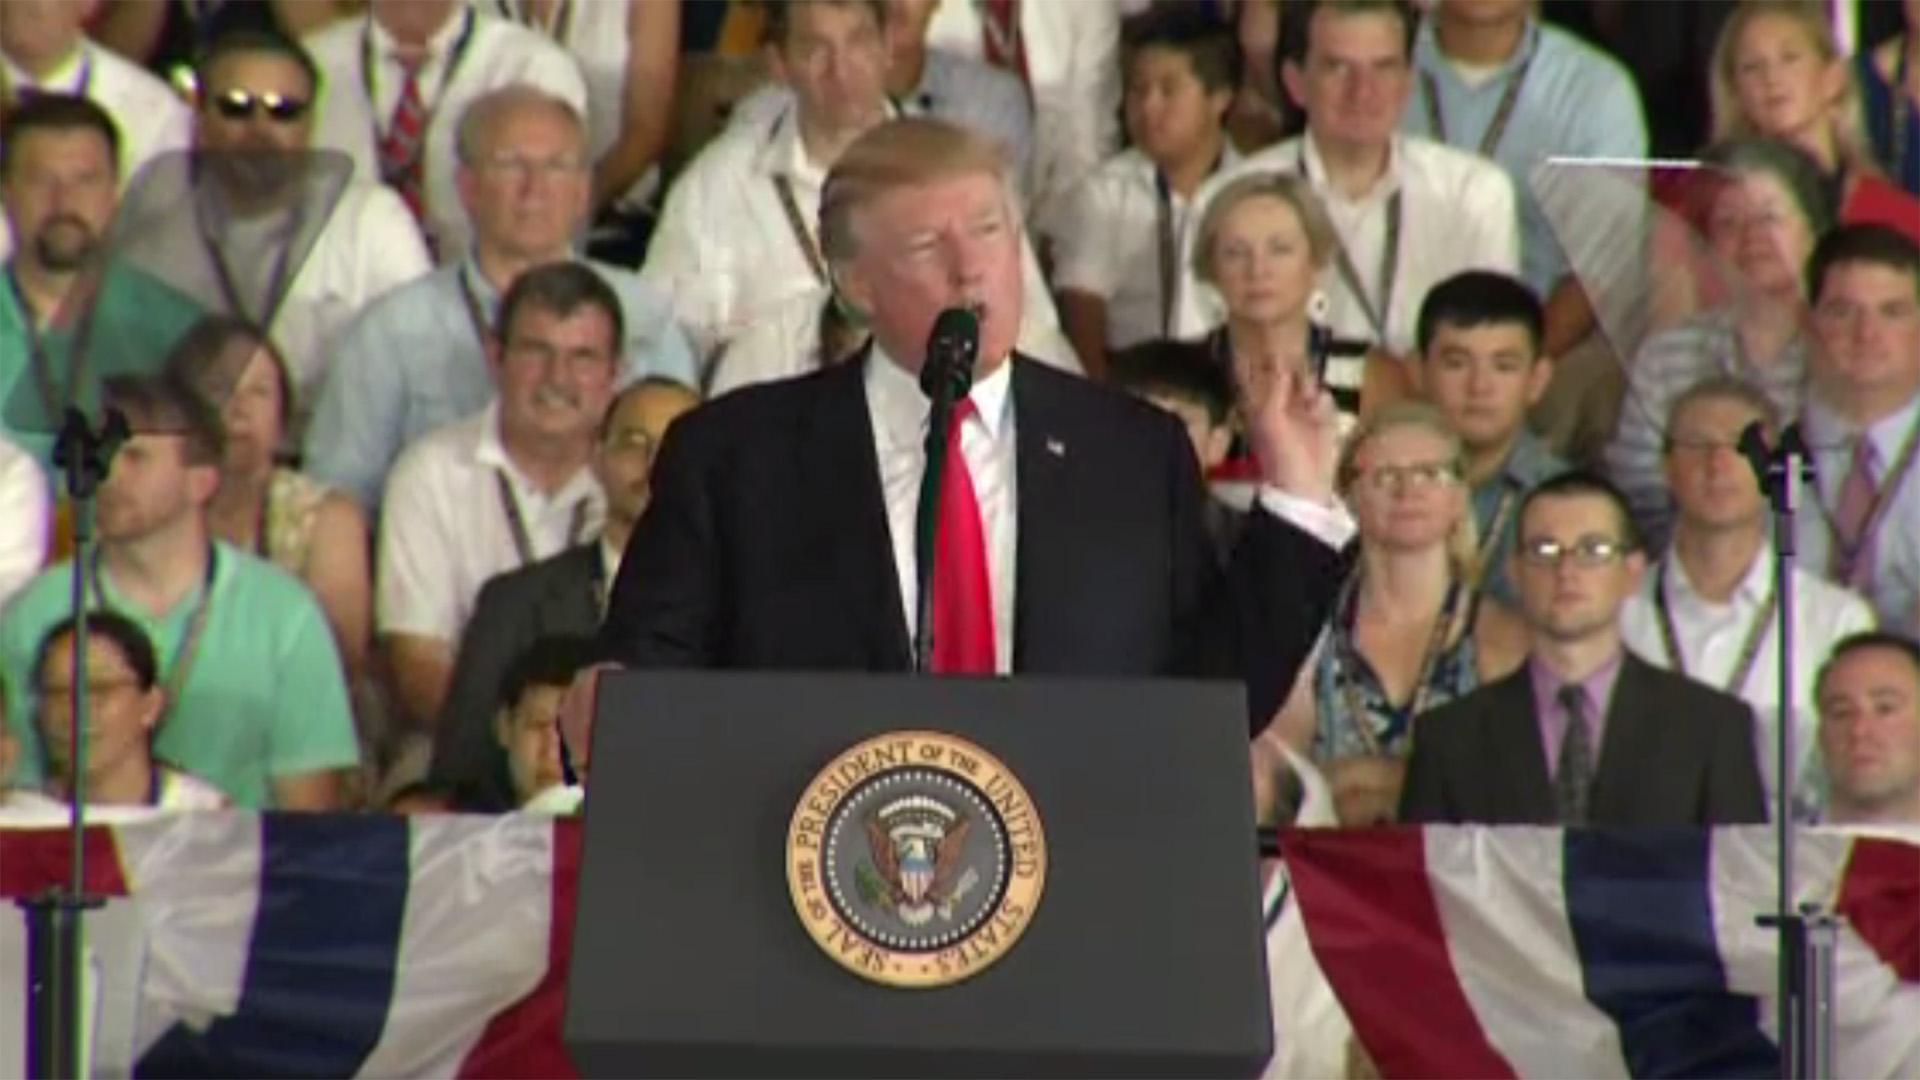 Donald Trump commissioning of USS gerald ford, video screenshot98428415-159532